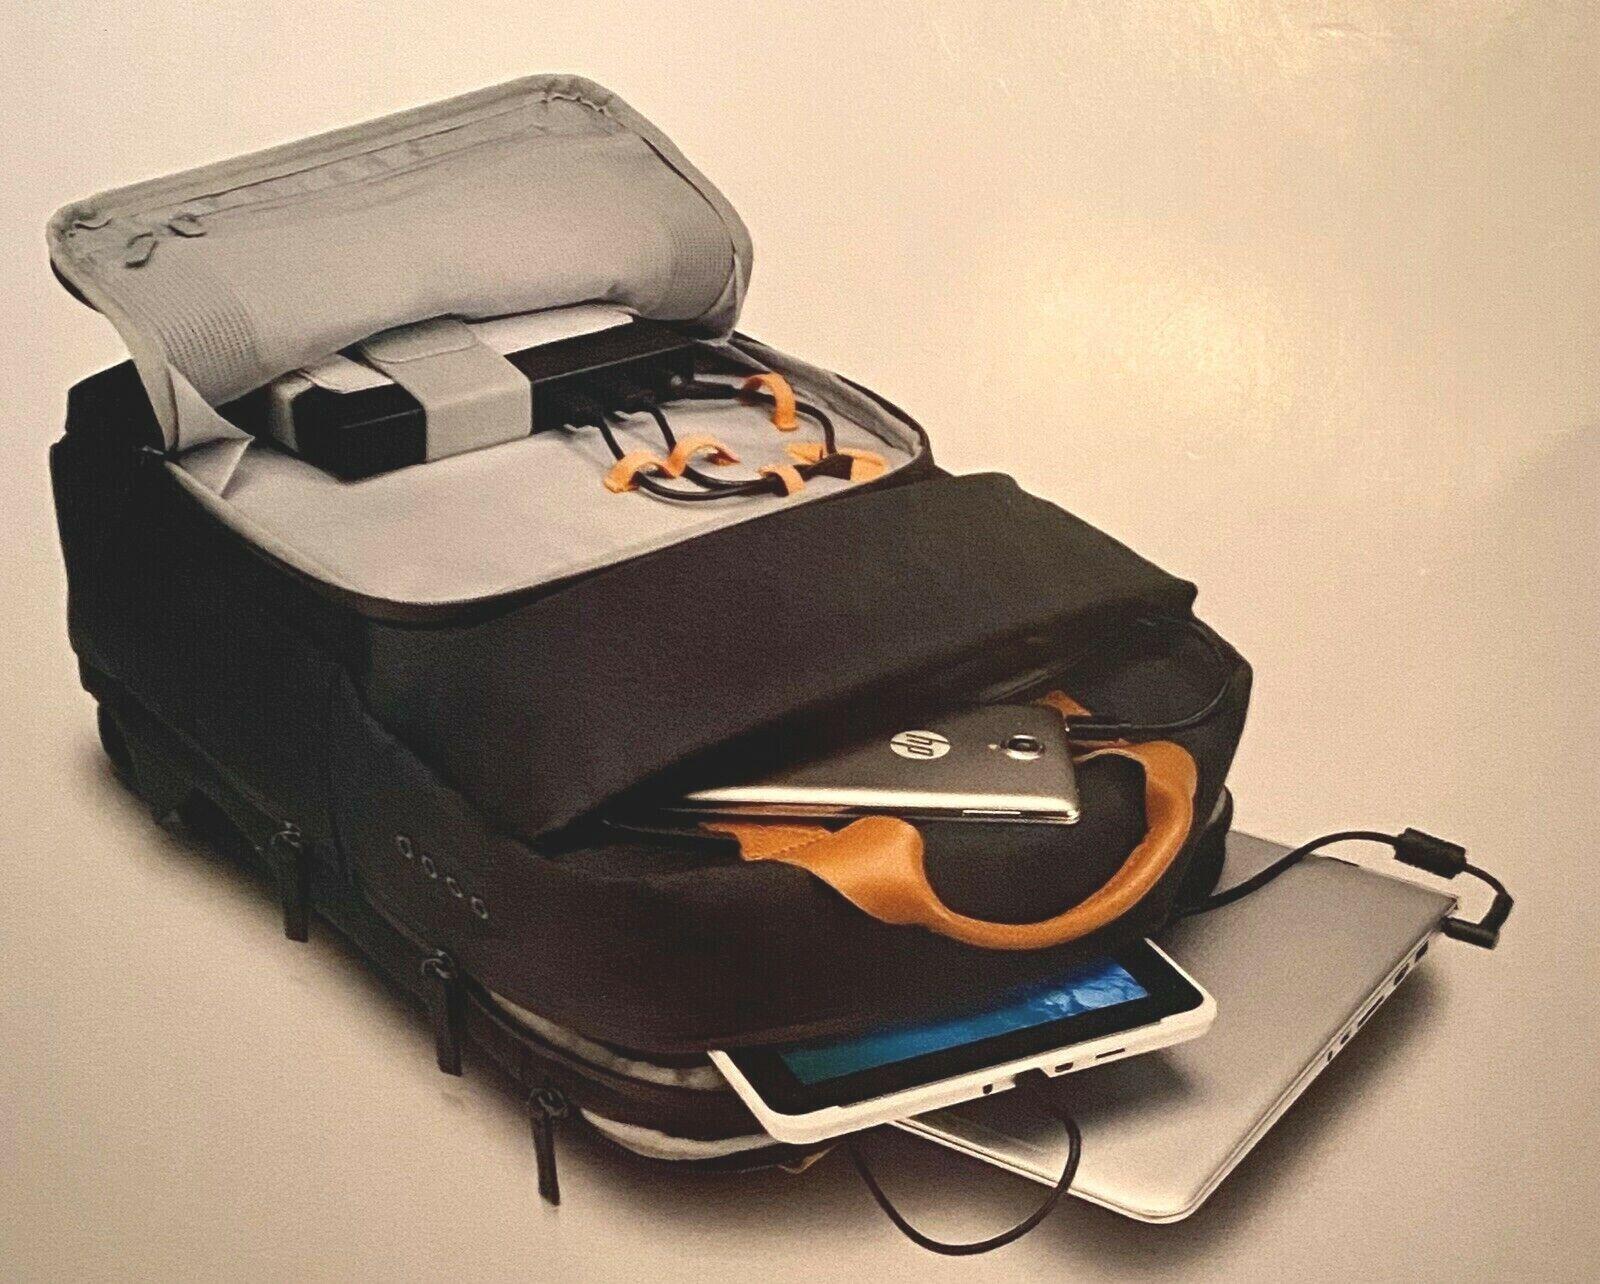 Hp - Laptop Backpack - Brown/gray